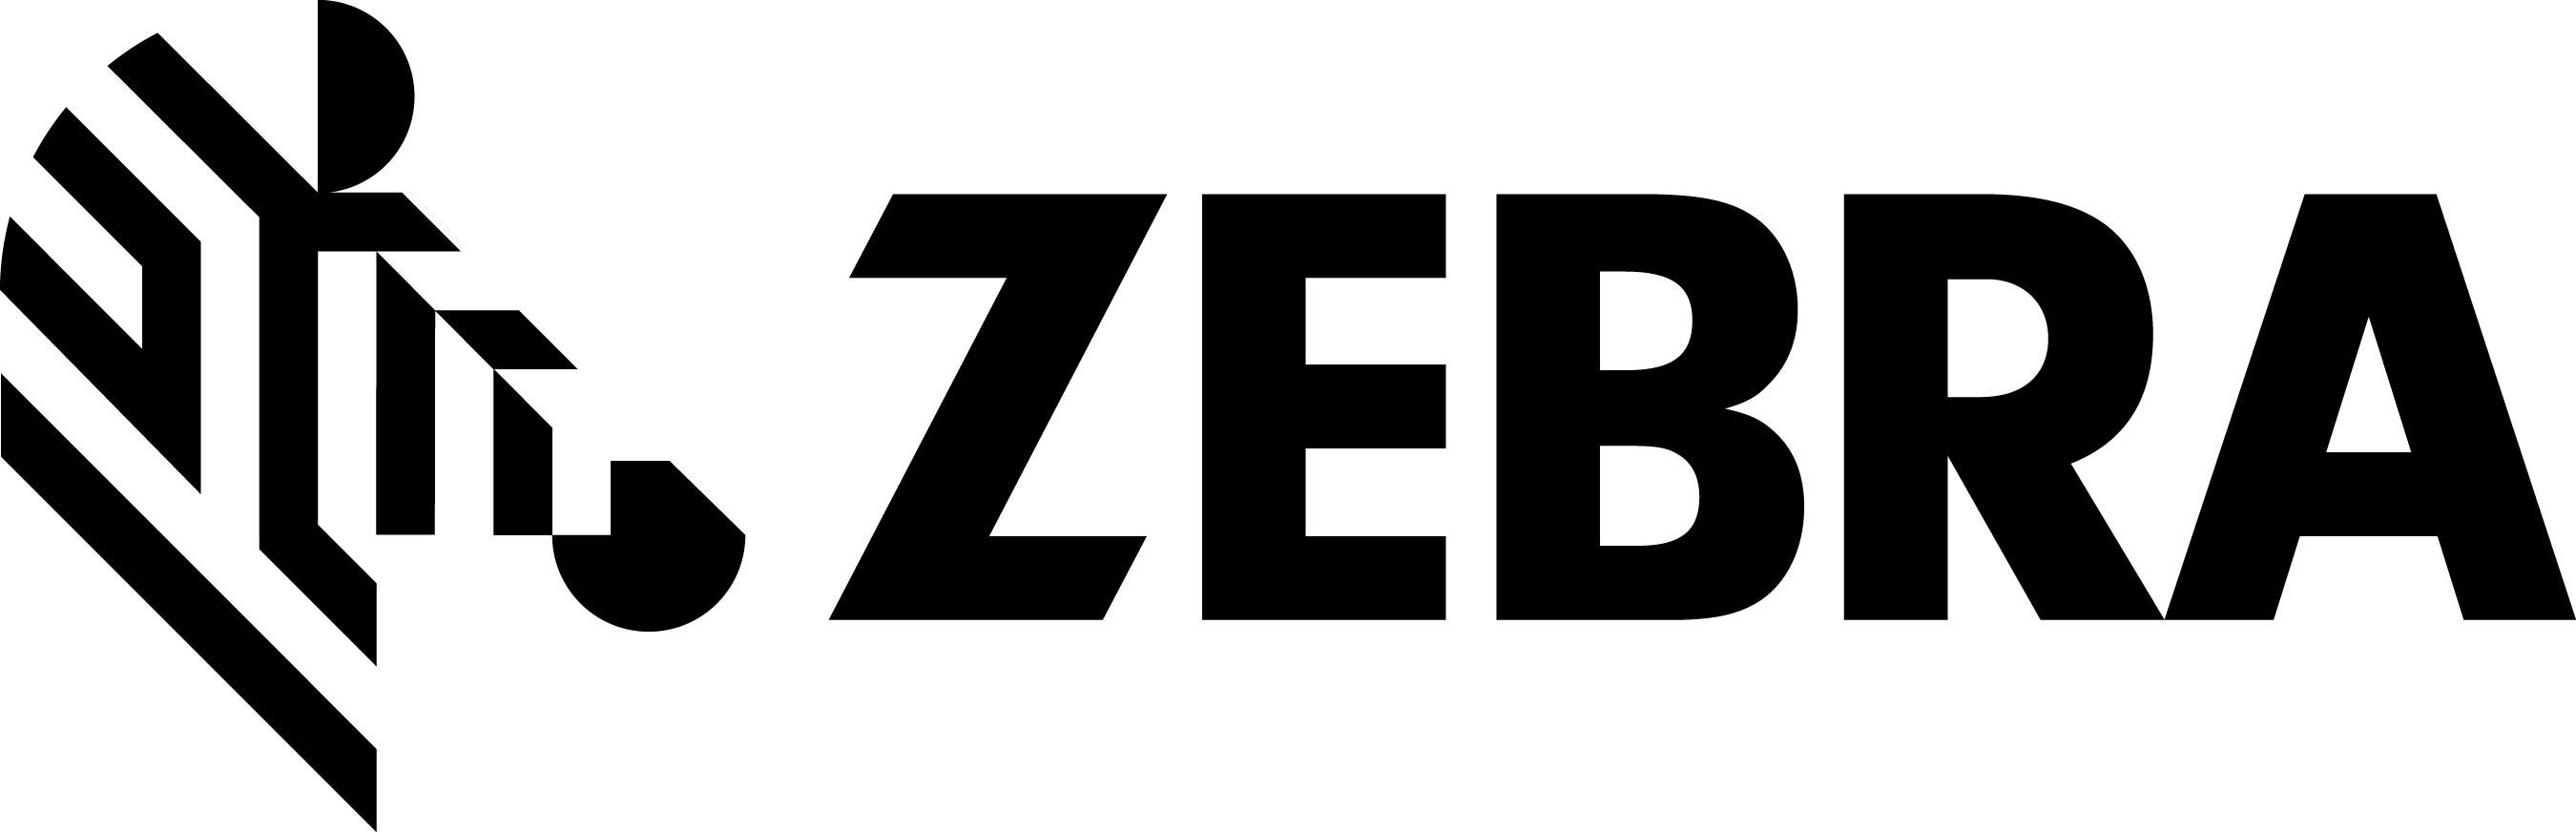 Zebra logo.